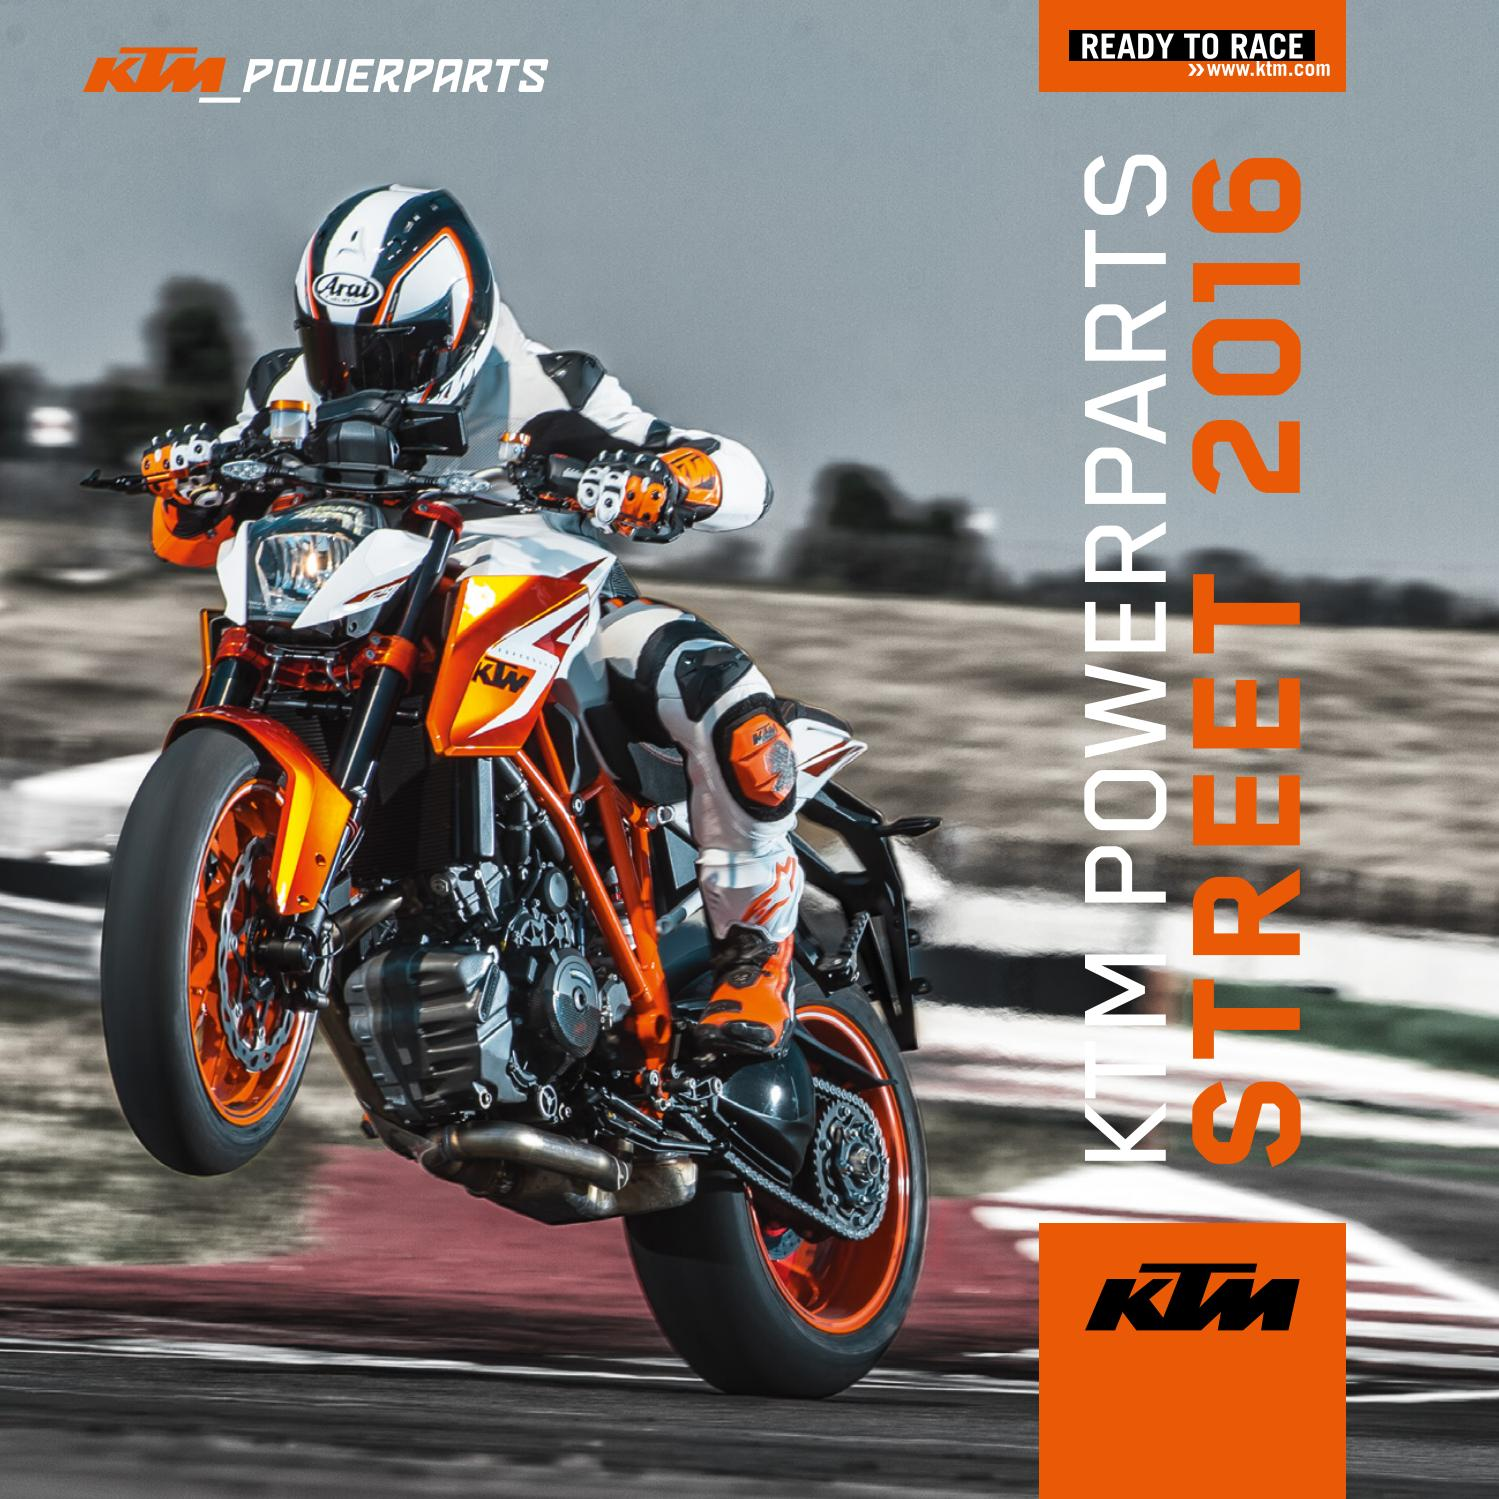 CLIPS 2X FUEL DIESEL PETROL SHUT//CUT OFF VALVE 6MM MOTORCYCLE IMMOBILISER